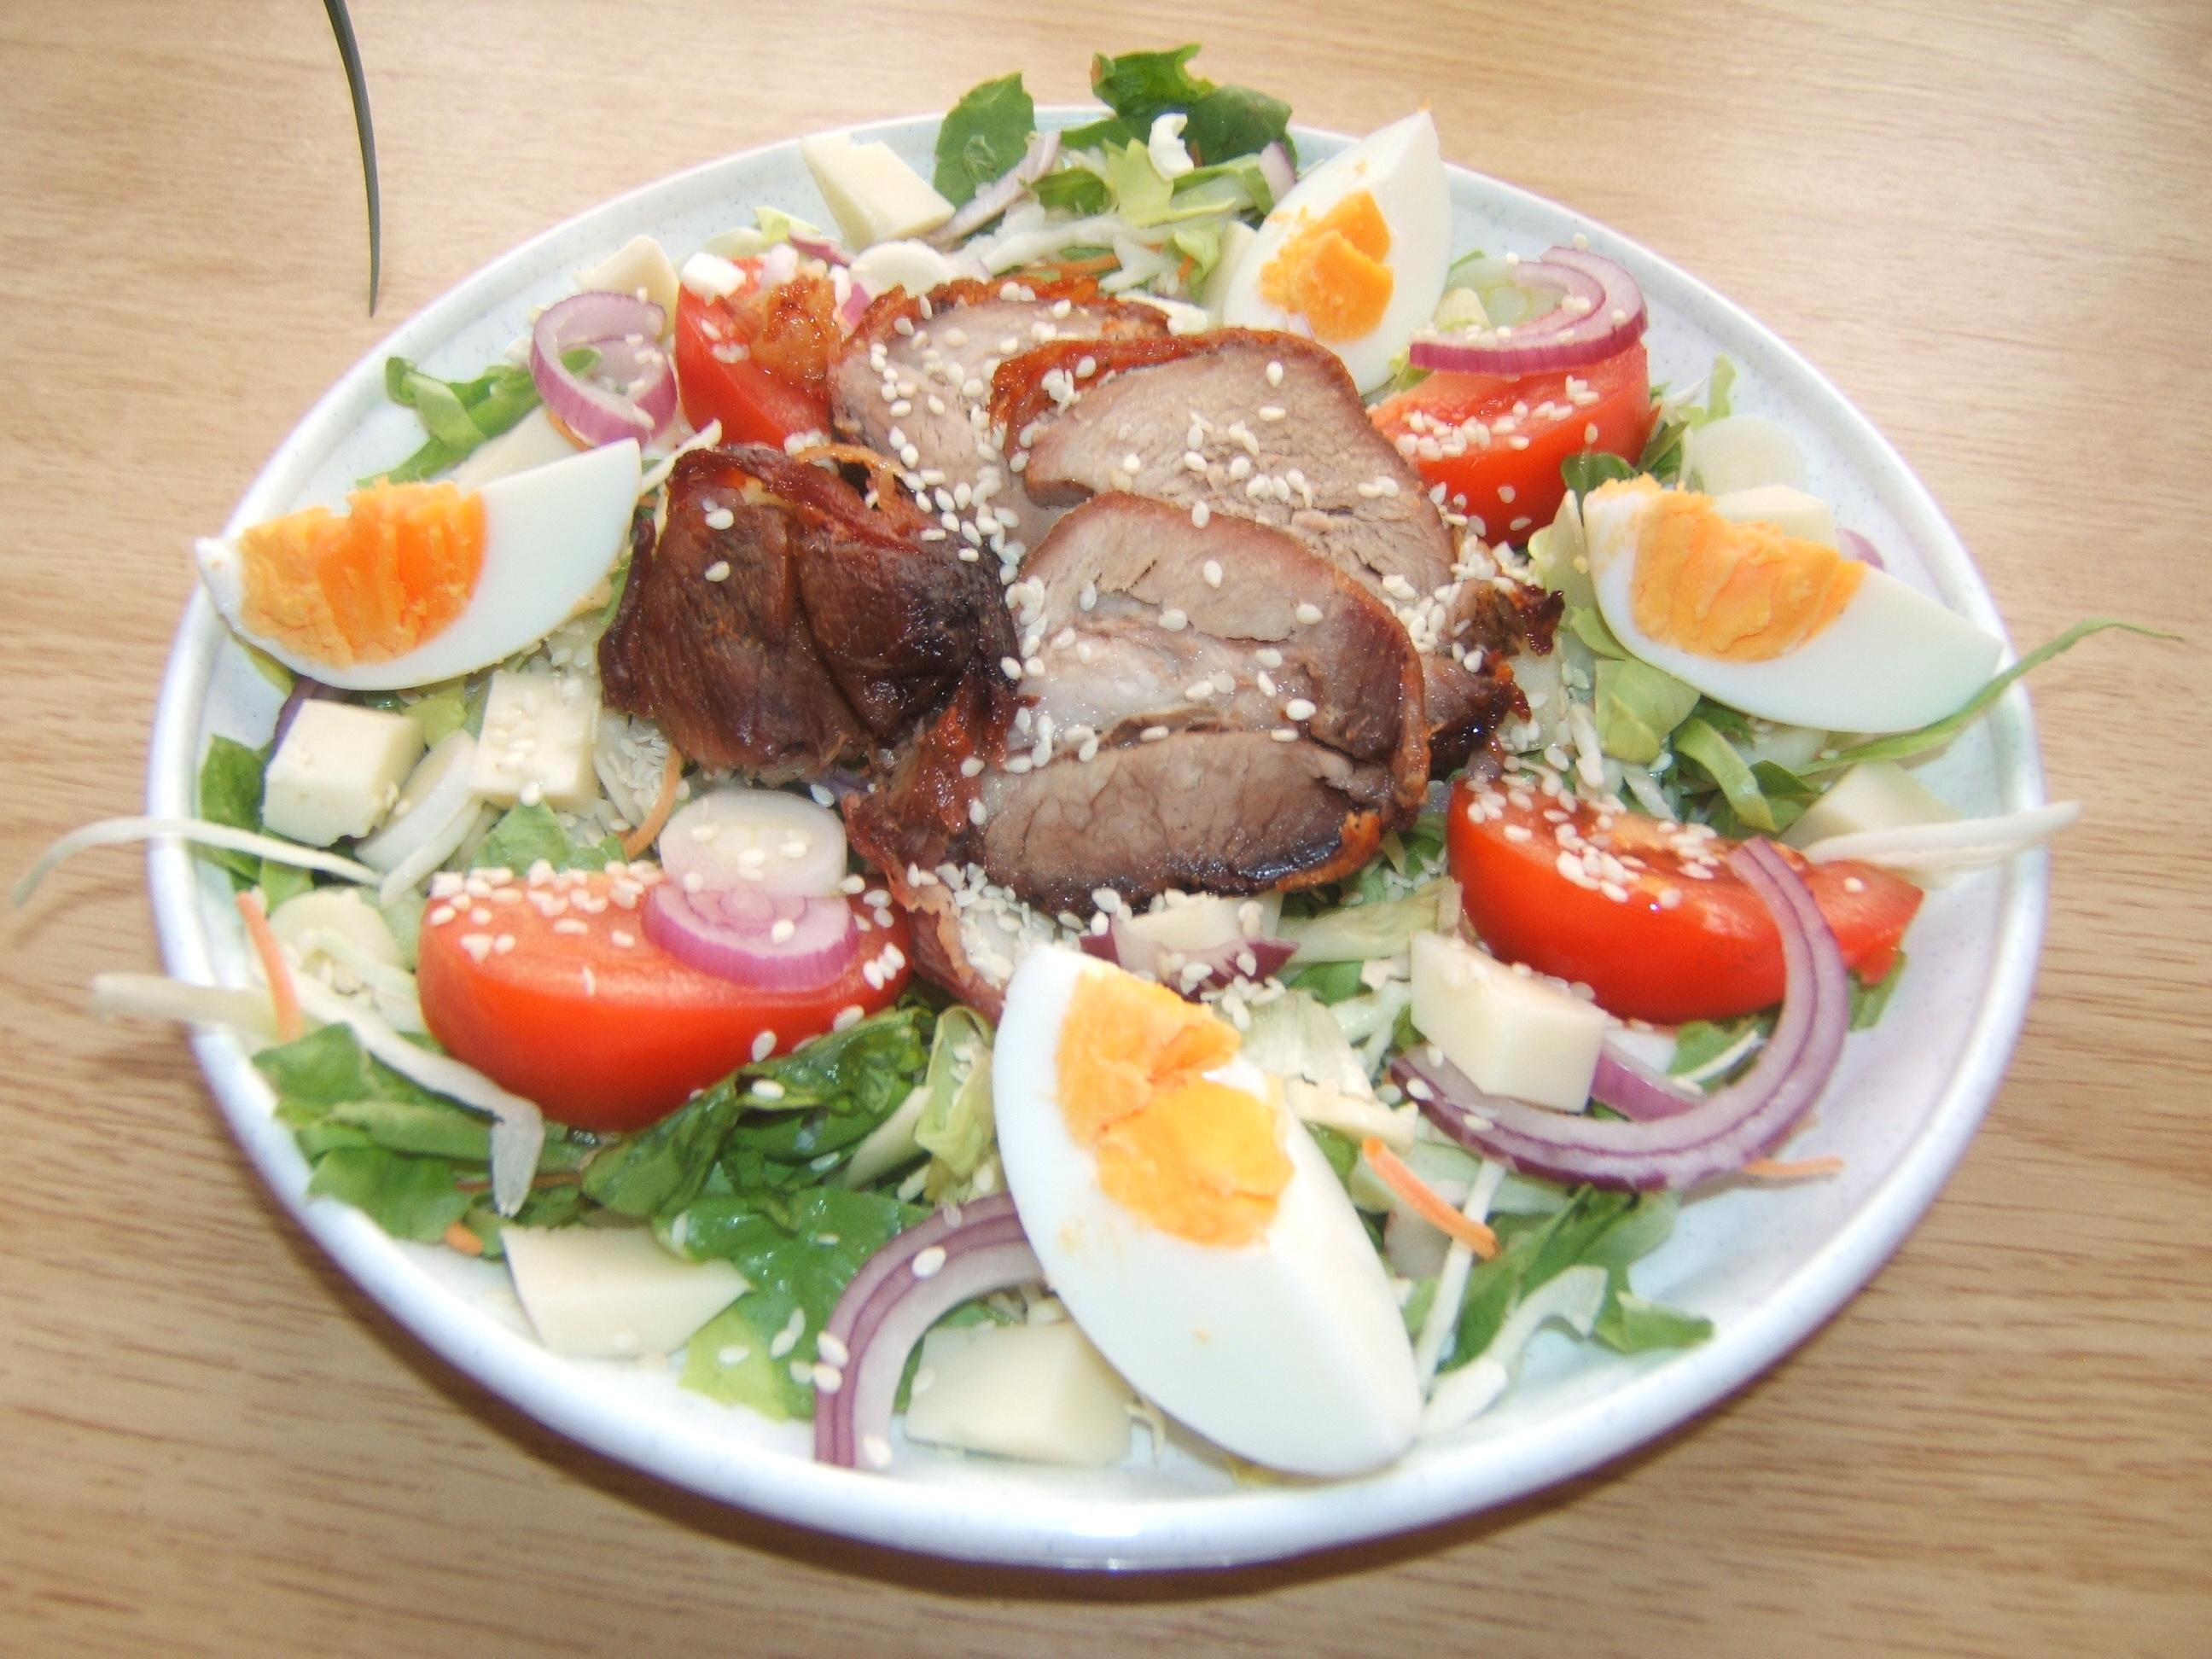 baconbe_tekert_kacsamell_salataval_glutenmentes_4.JPG